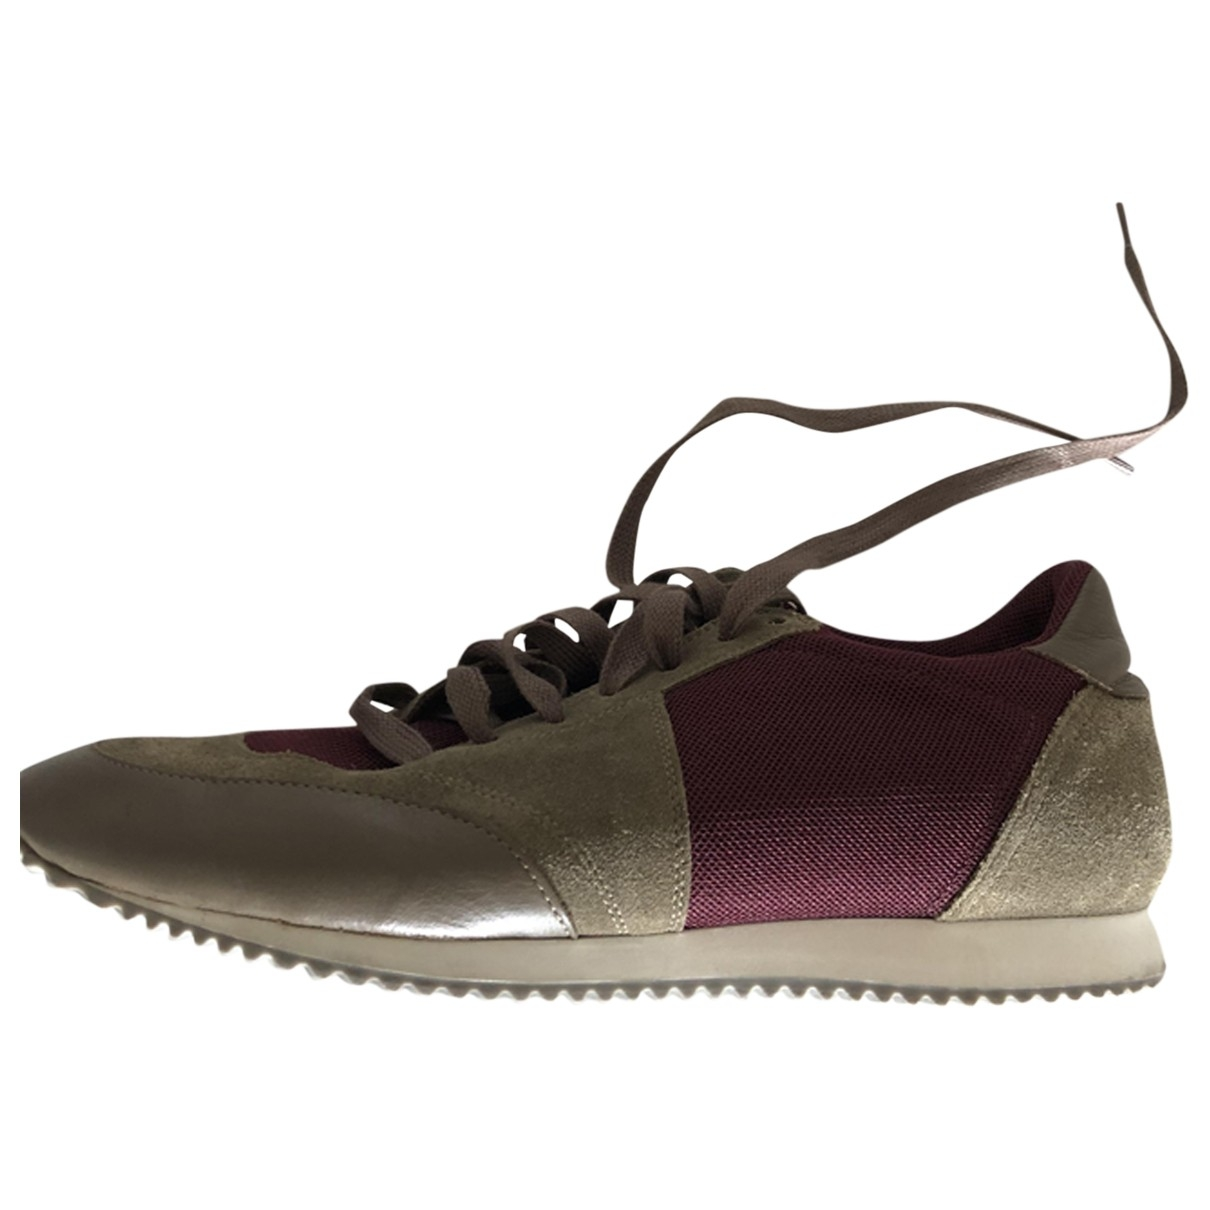 Faconnable \N Khaki Cloth Trainers for Men 41 EU